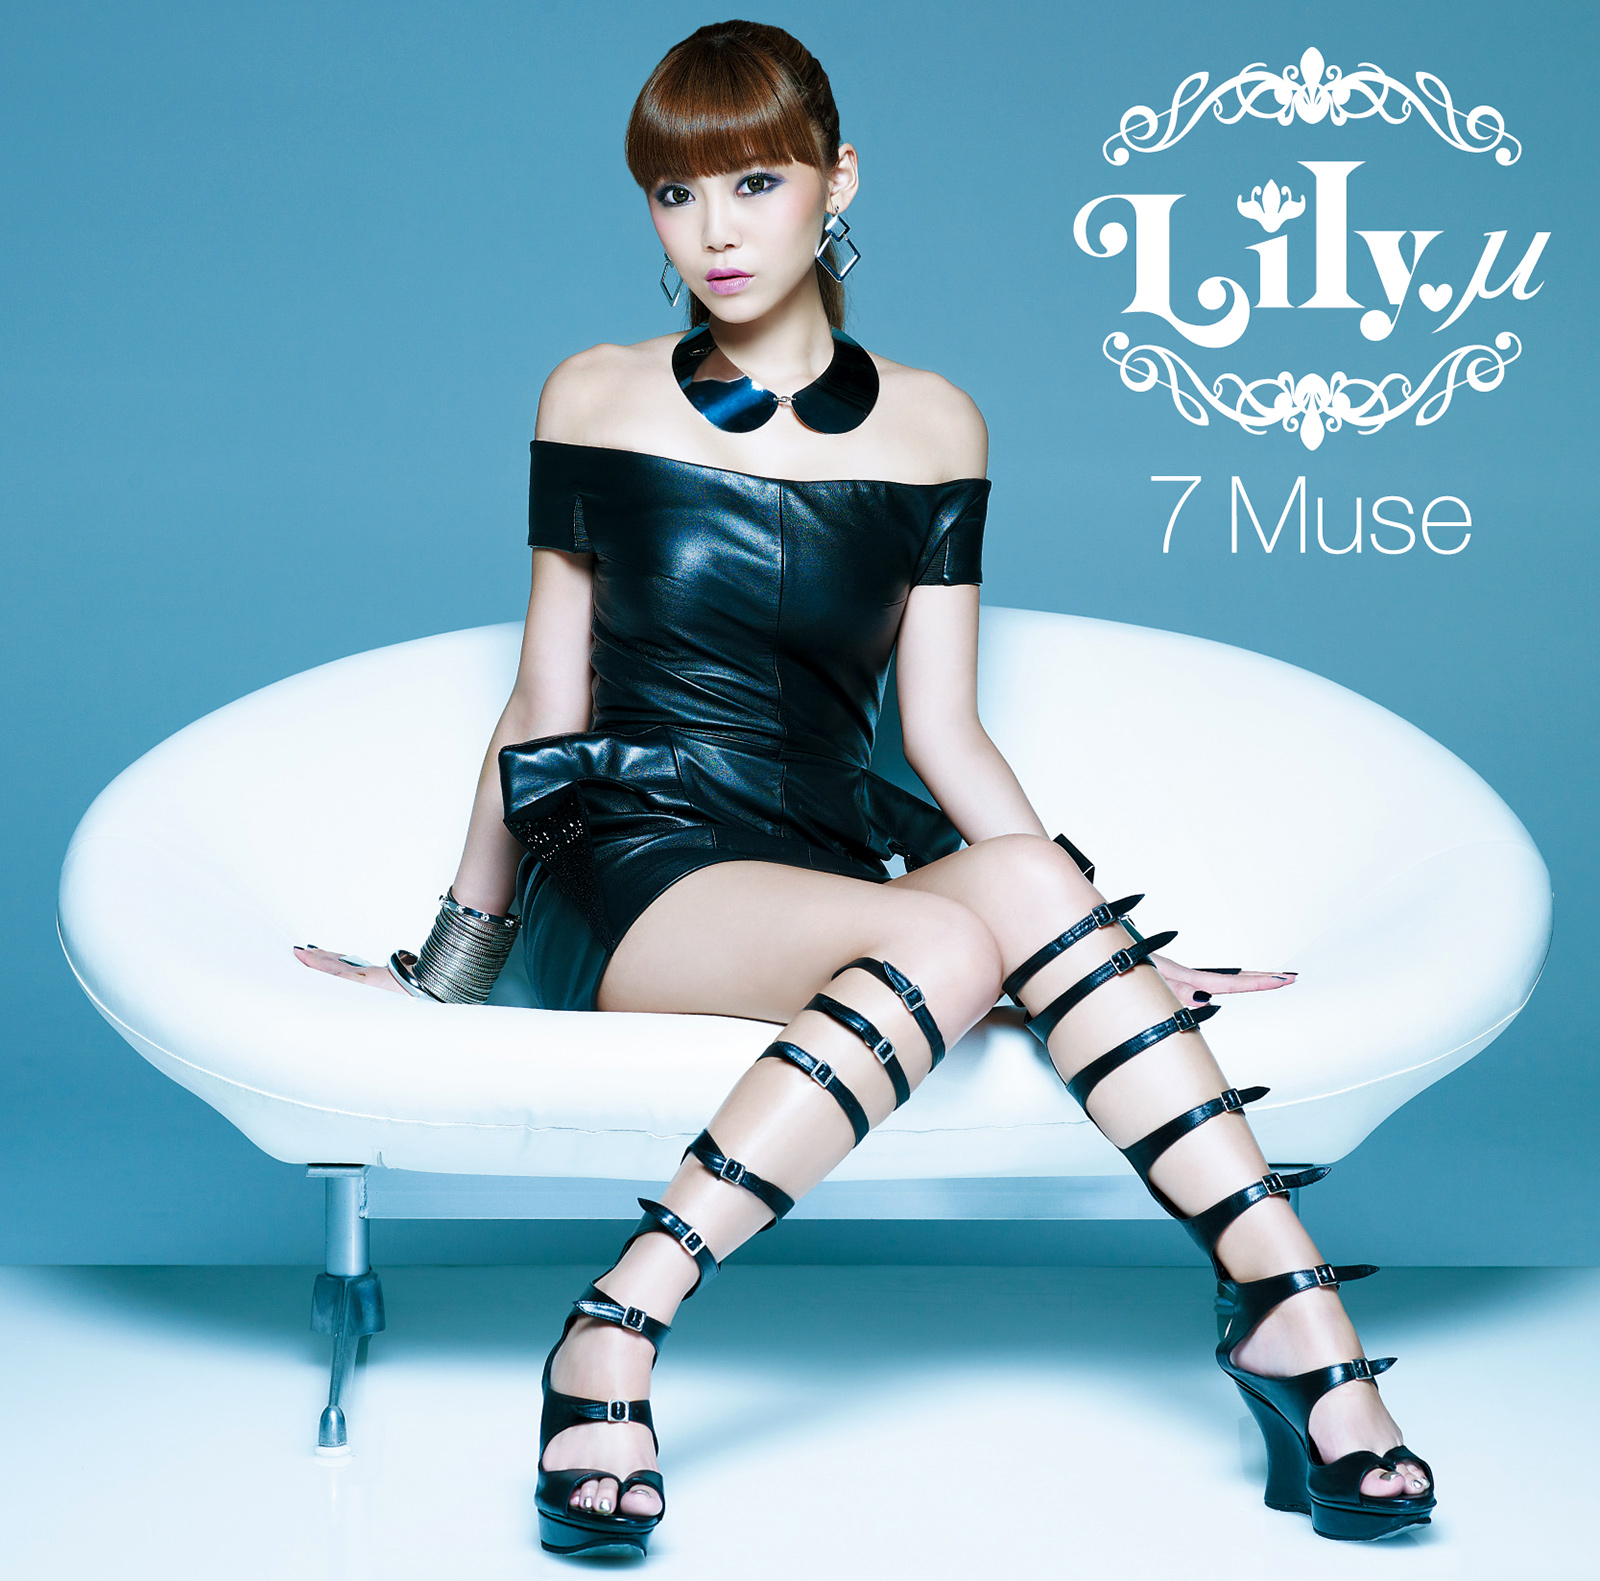 7 Muse